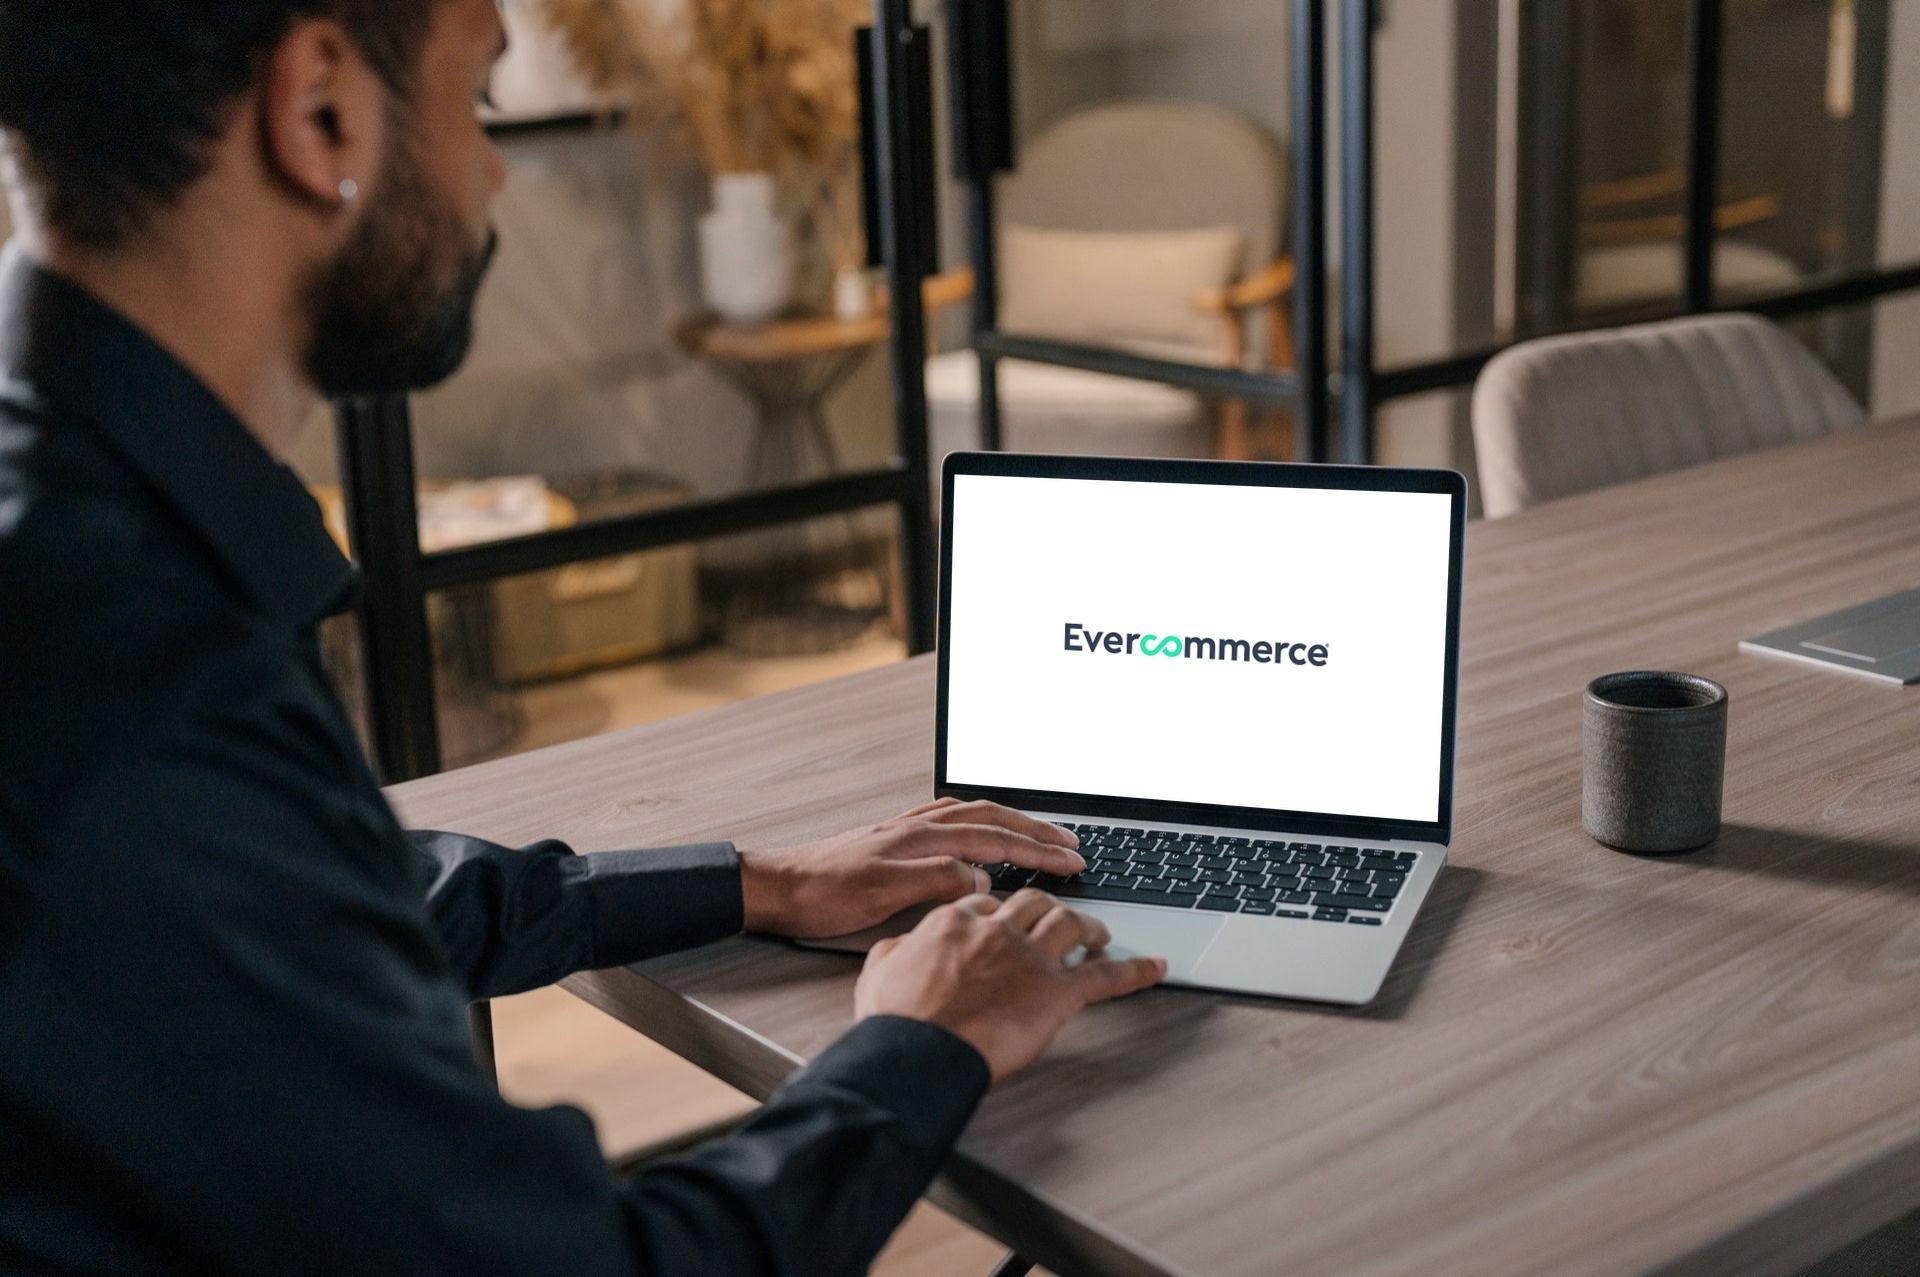 EverCommerce Initial Public Offering